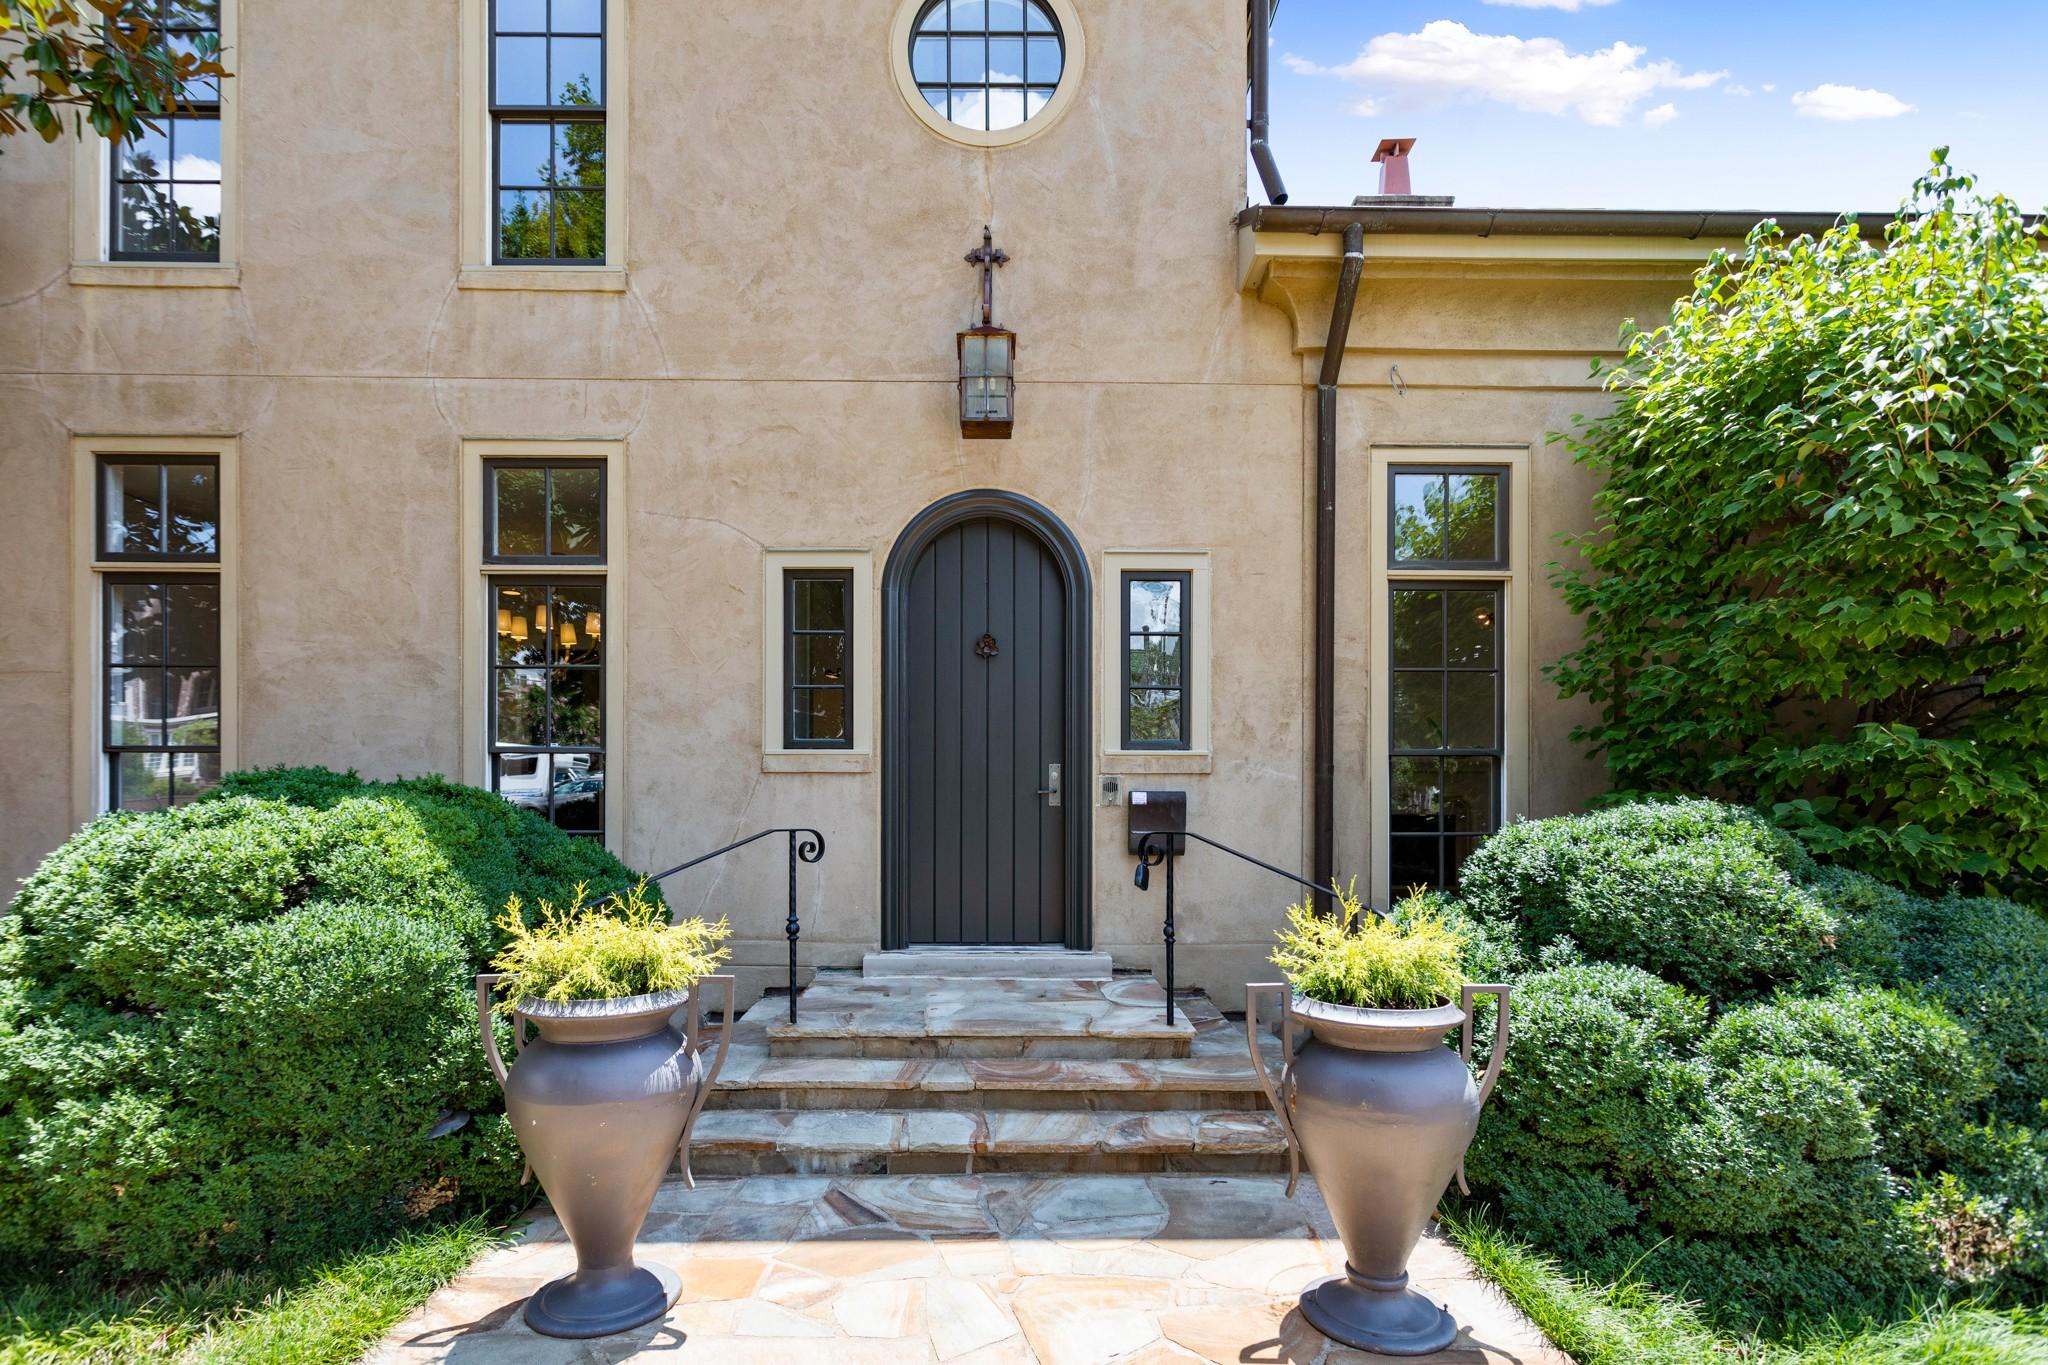 $1,595,000 - 3Br/4Ba -  for Sale in Craighead, Nashville